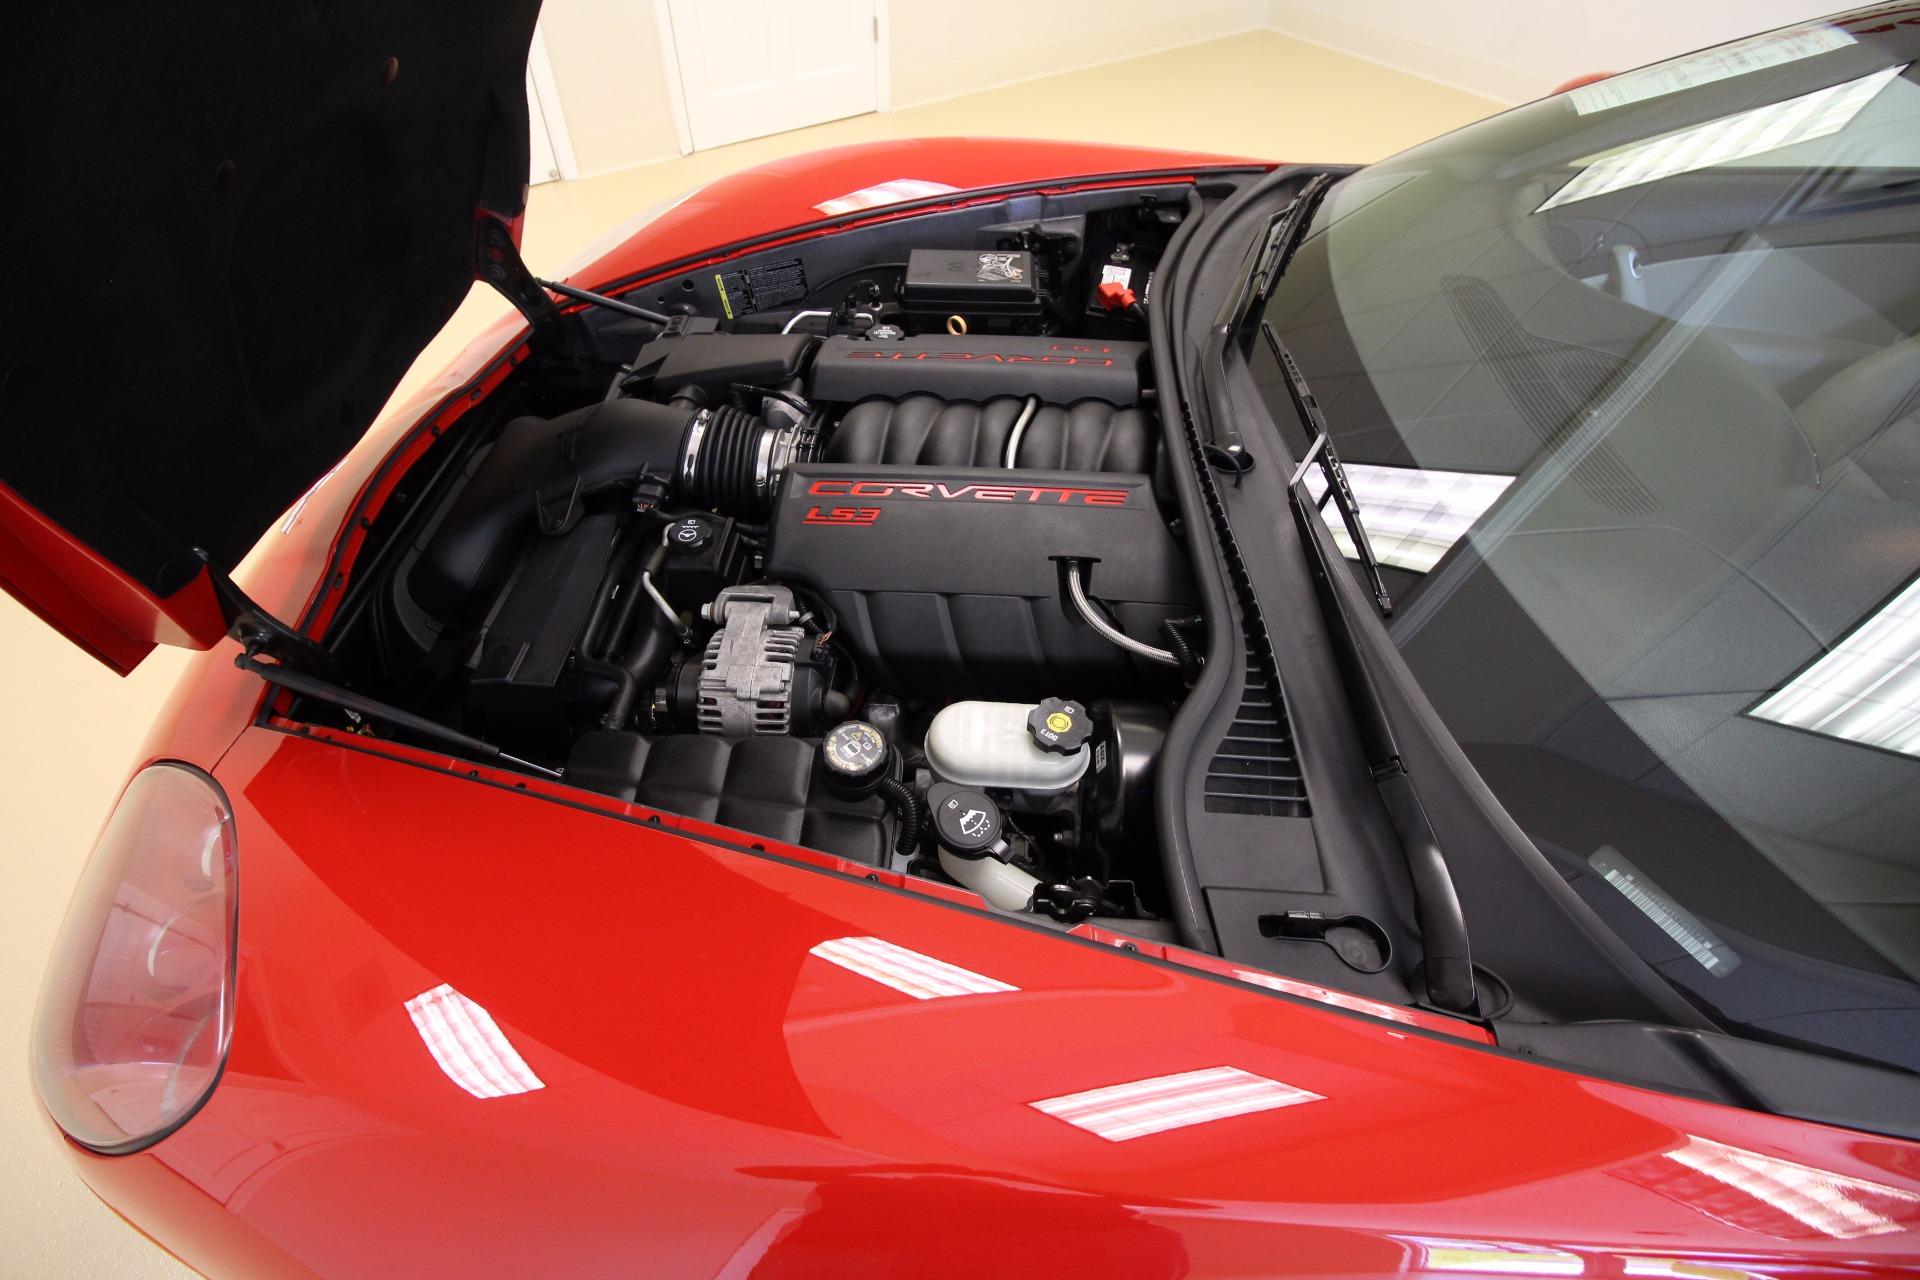 Used 2008 Chevrolet Corvette Coupe LT2 | Albany, NY